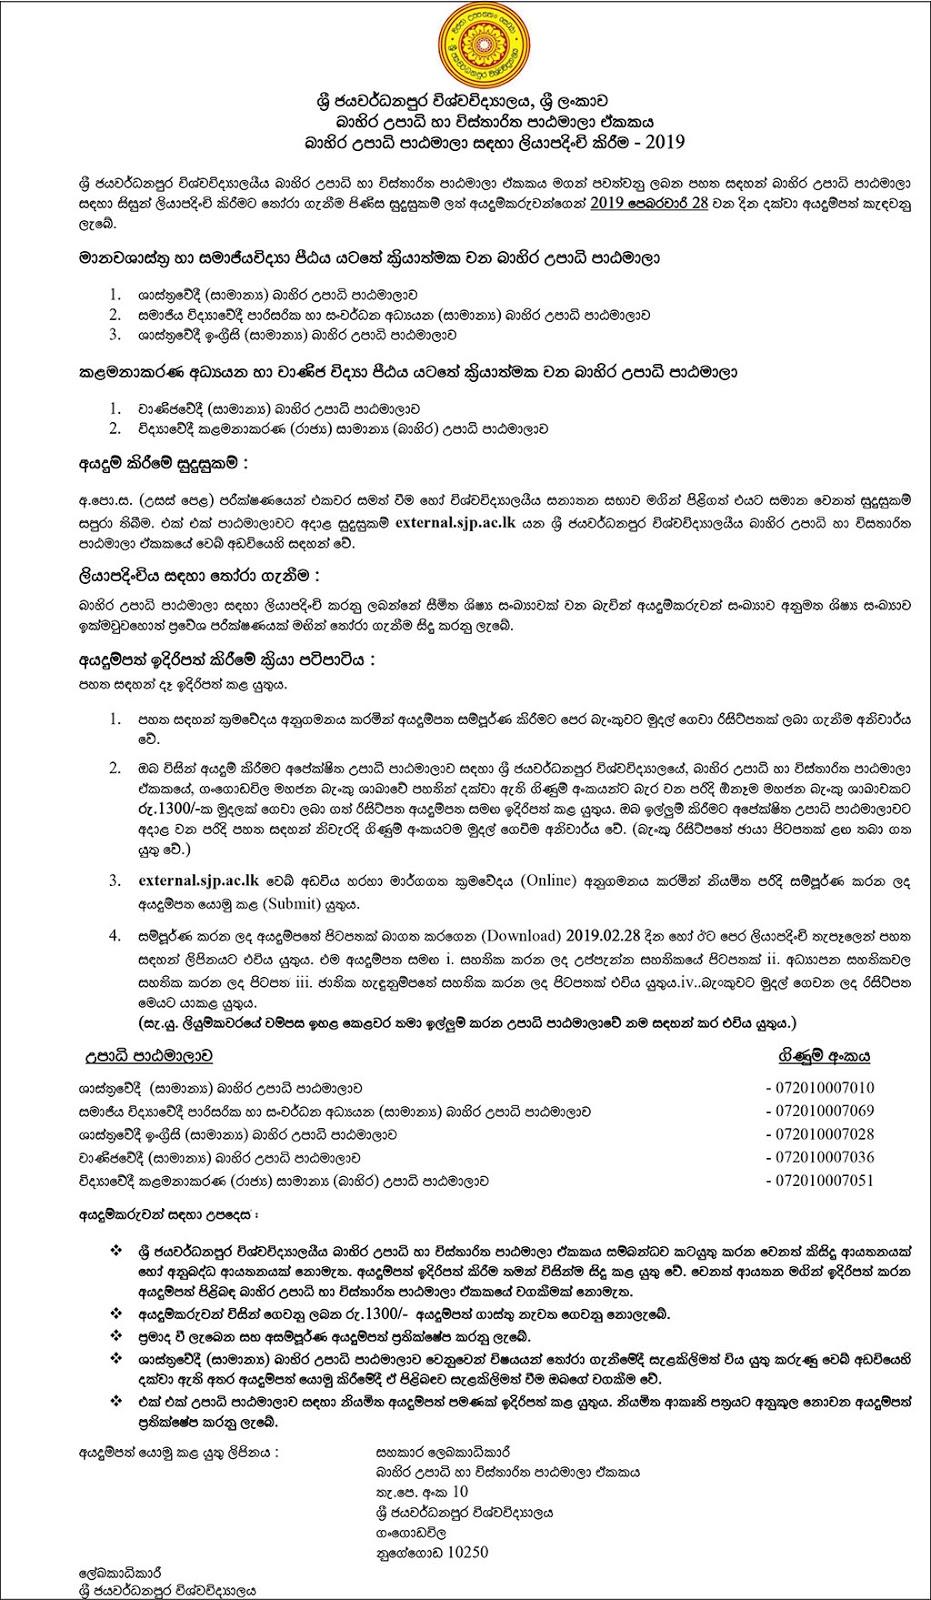 www kdu ac lk application 2019